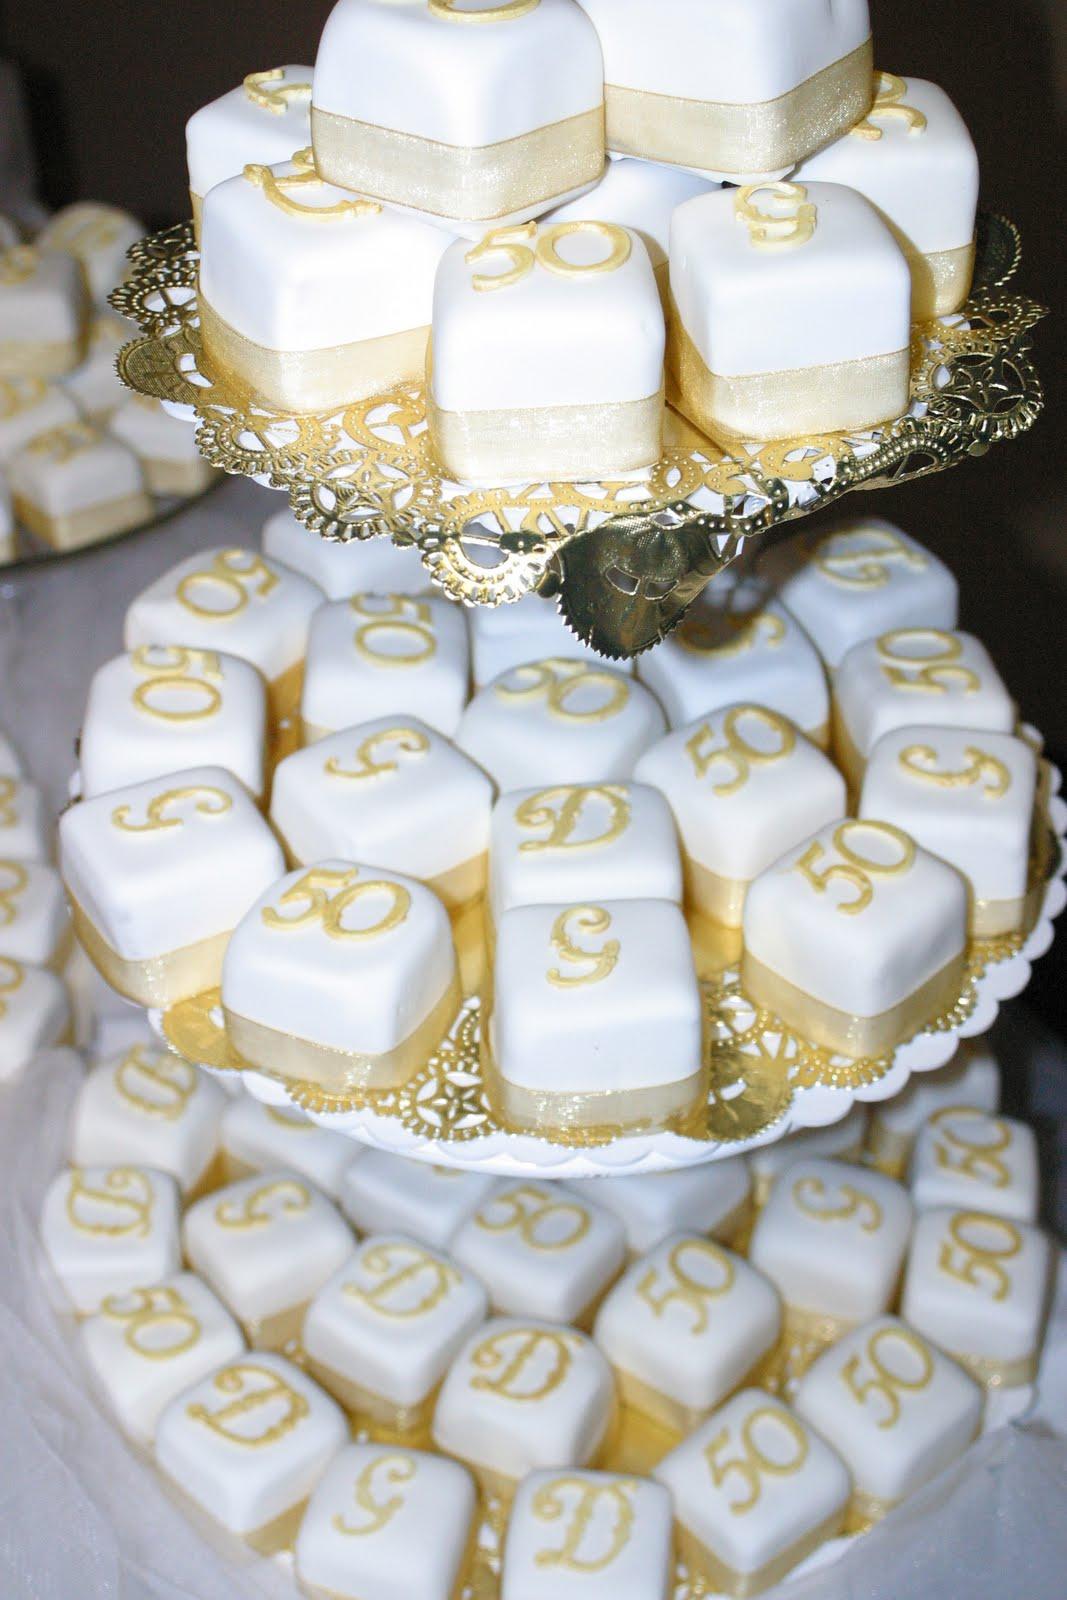 Creative CSI: Cricut Cake - 50th Anniversary!